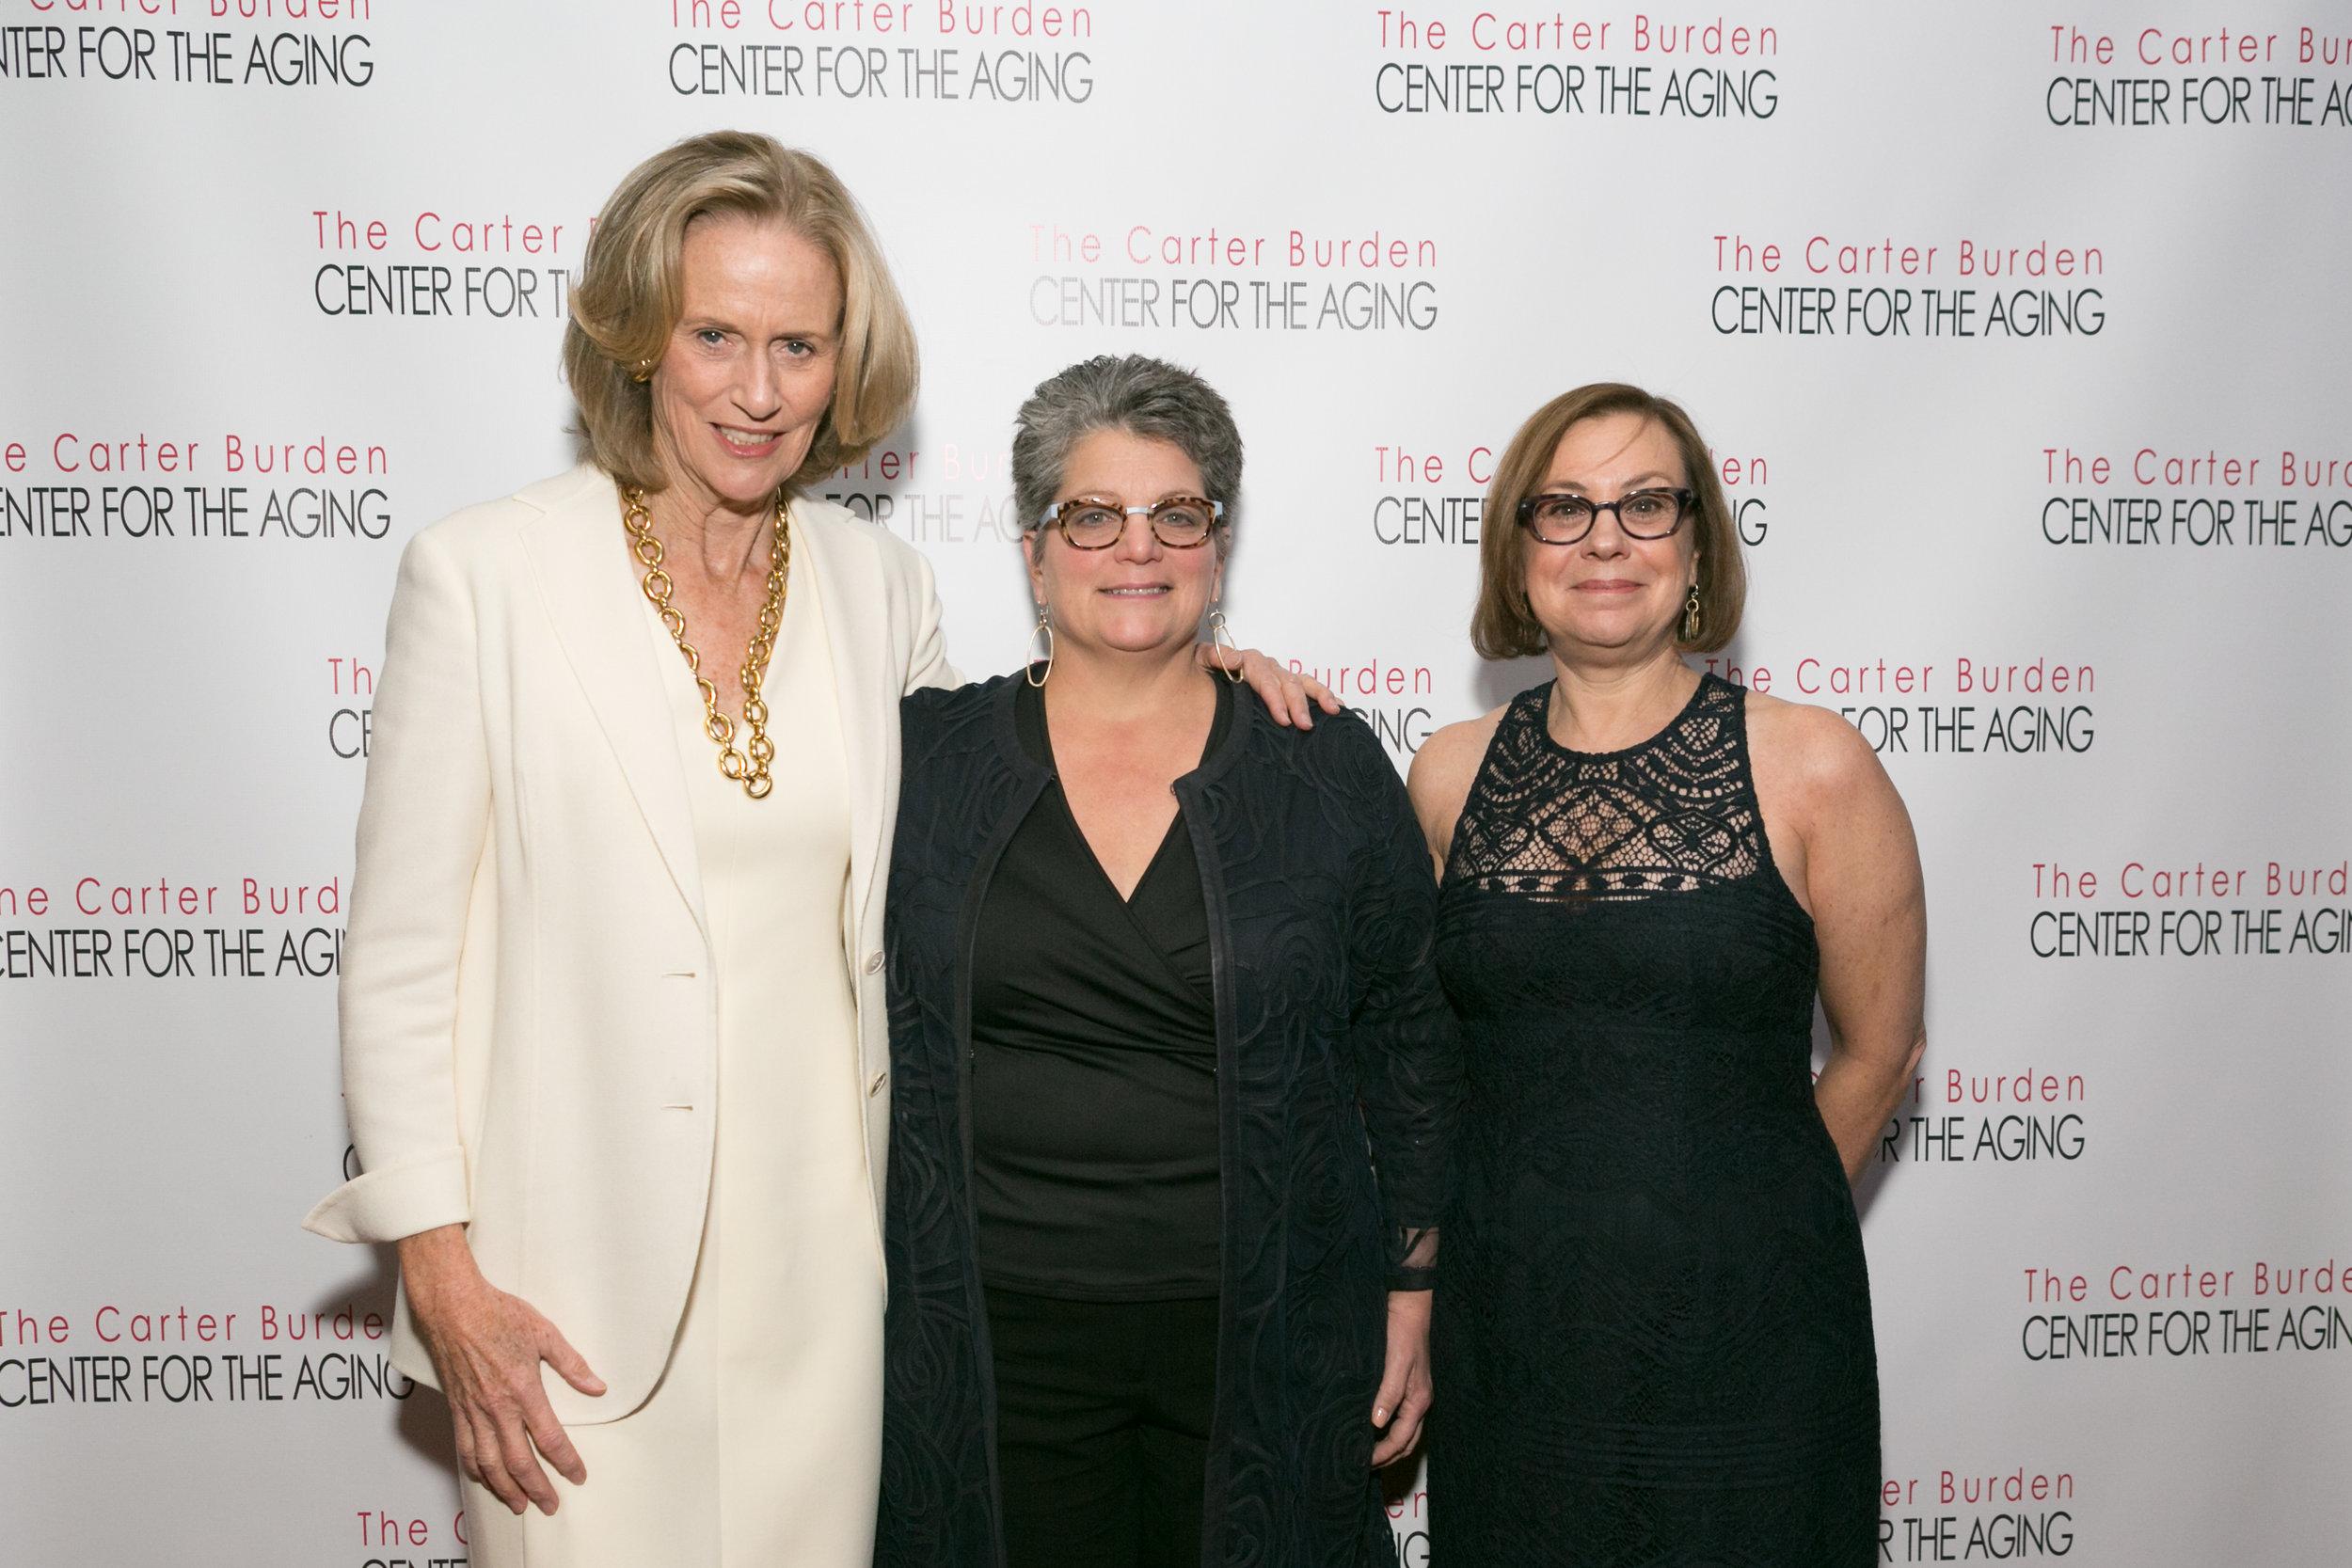 Susan L. Burden   , Board Member, Carter Burden Network; Donna M. Corrado , Commissioner, NYC Department for the Aging; Caryn Resnick , Deputy Commissioner, NYC Department for the Aging